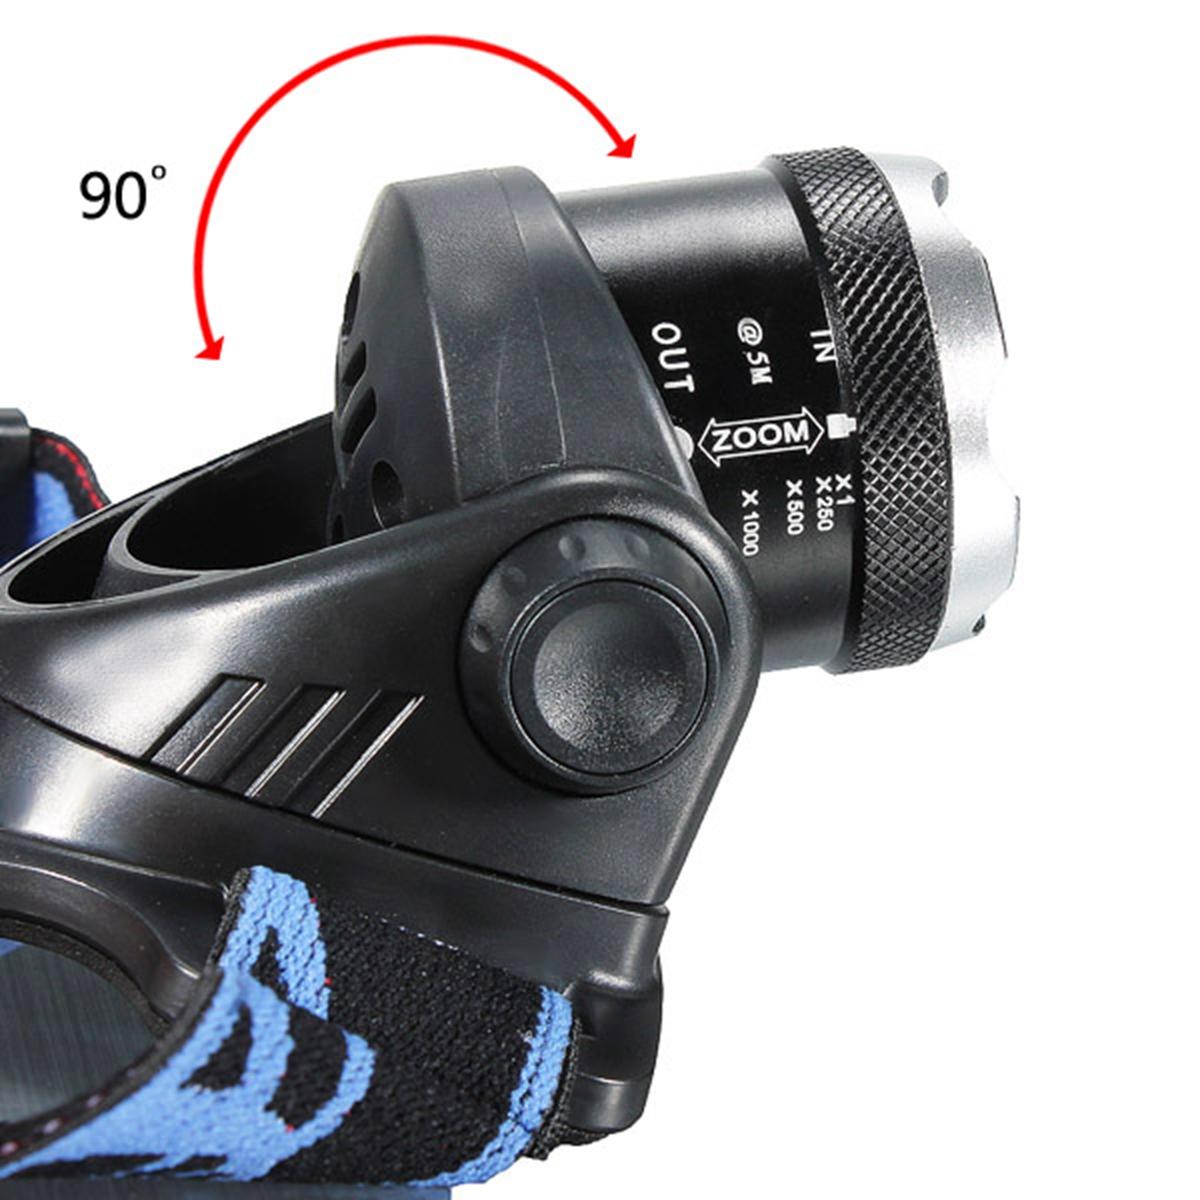 Elfeland T6 Led 3000 Lumen Zoomable Rechargeable Headlamp Headlight